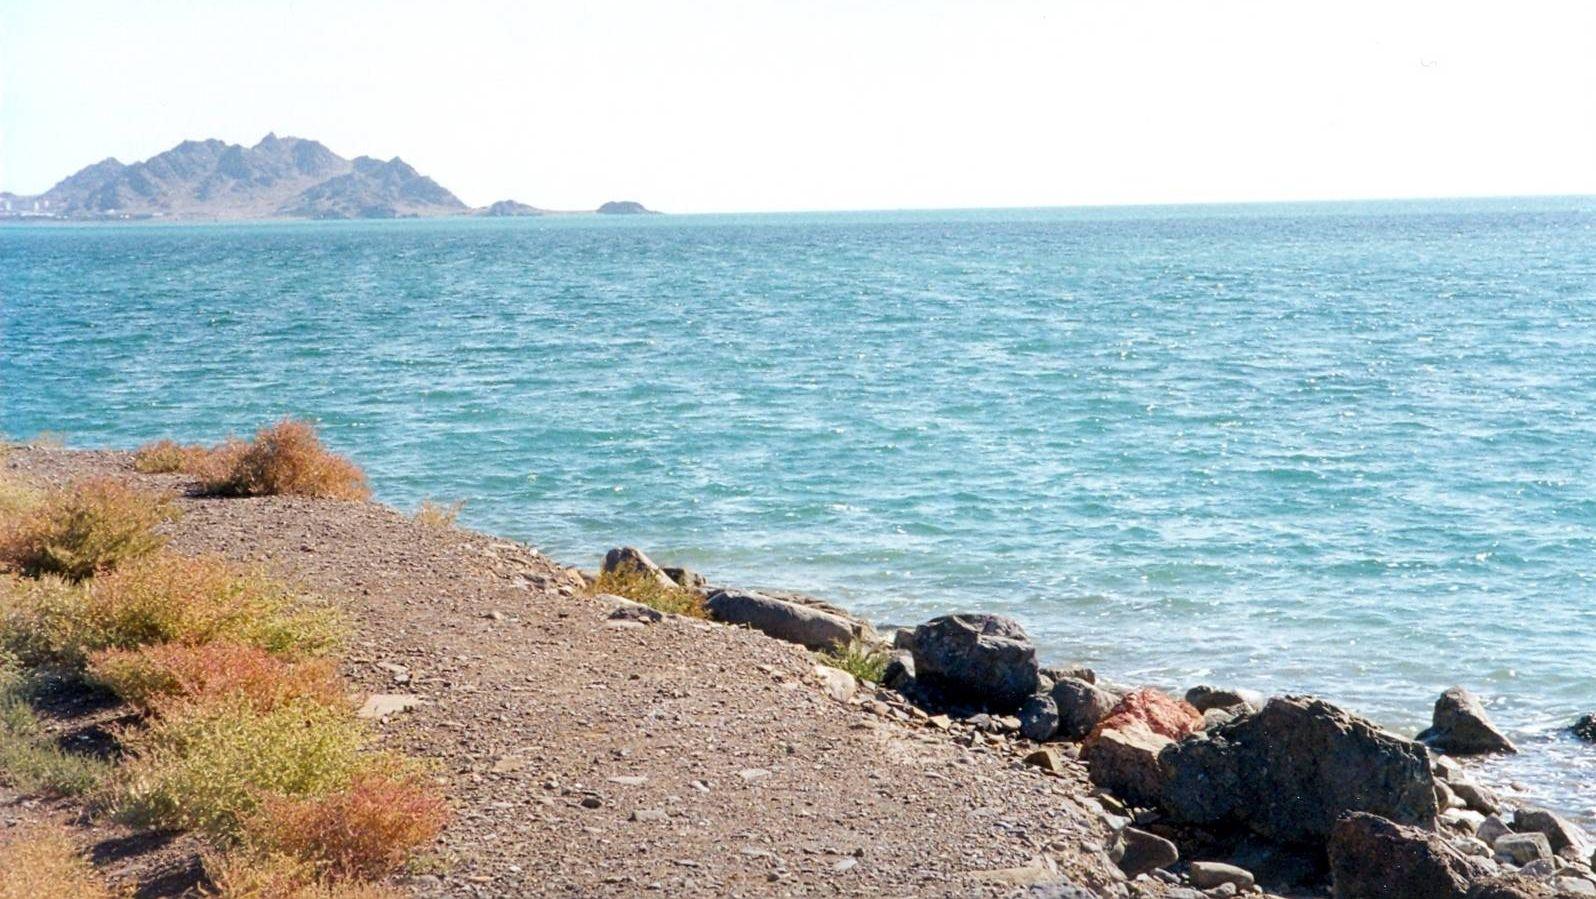 Каспийское море - вид с туркменского берега - 2000 год.